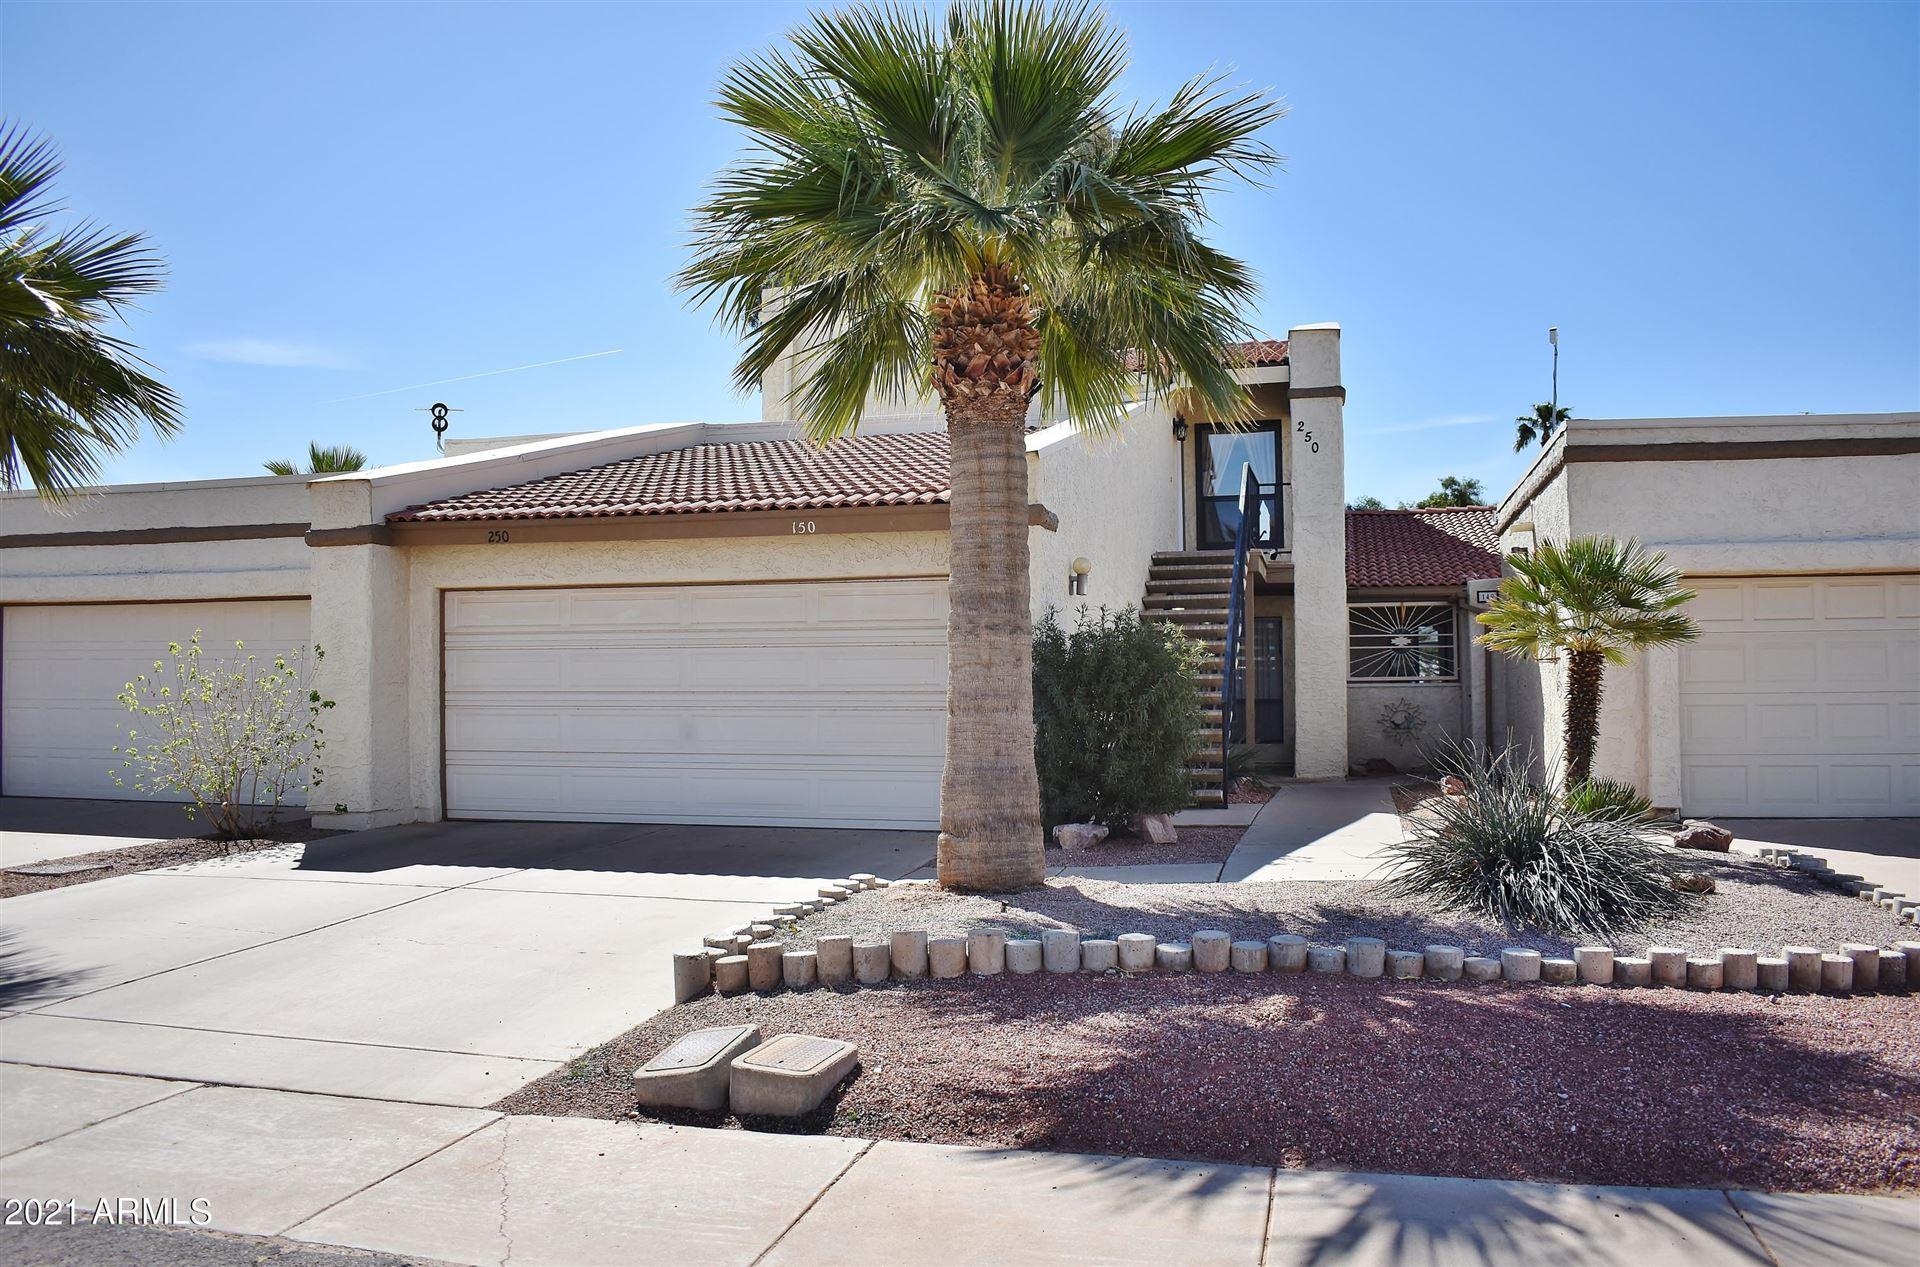 8815 W AVENIDA DE AMIGOS Circle #250, Arizona City, AZ 85123 - MLS#: 6205911